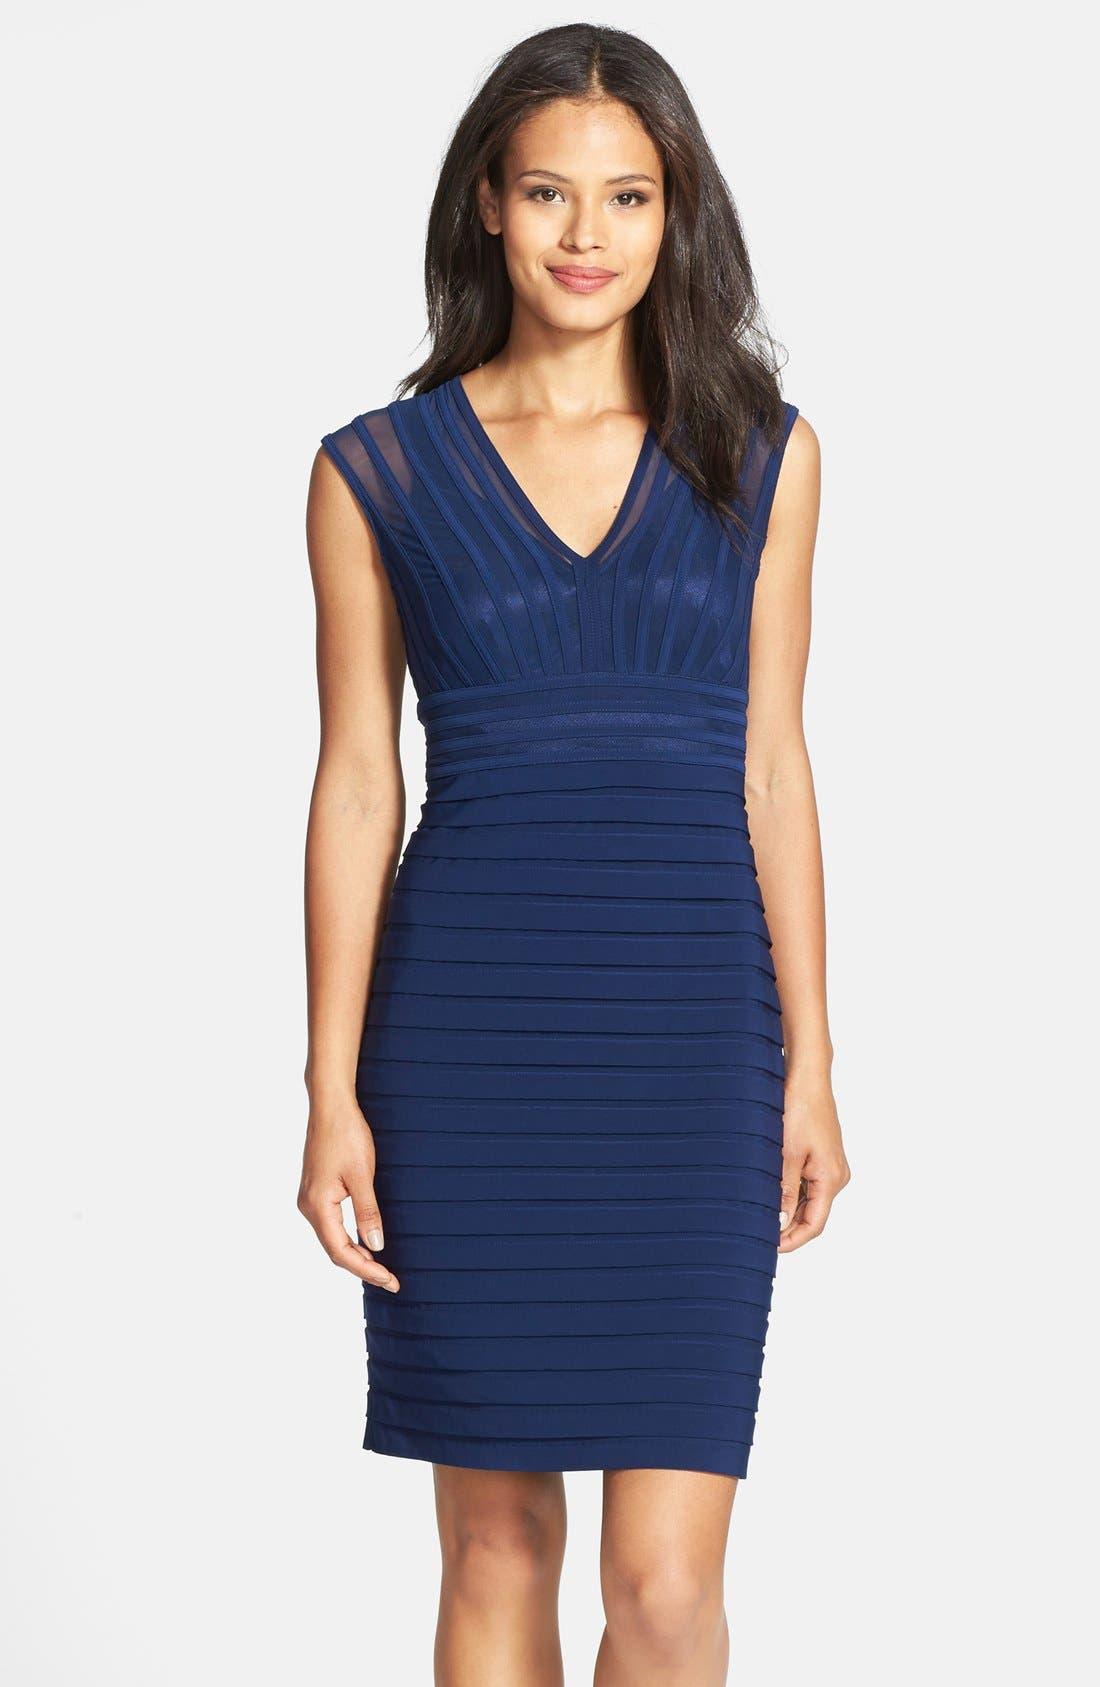 Alternate Image 1 Selected - Adrianna Papell Shutter Pleat Jersey Sheath Dress (Regular & Petite)